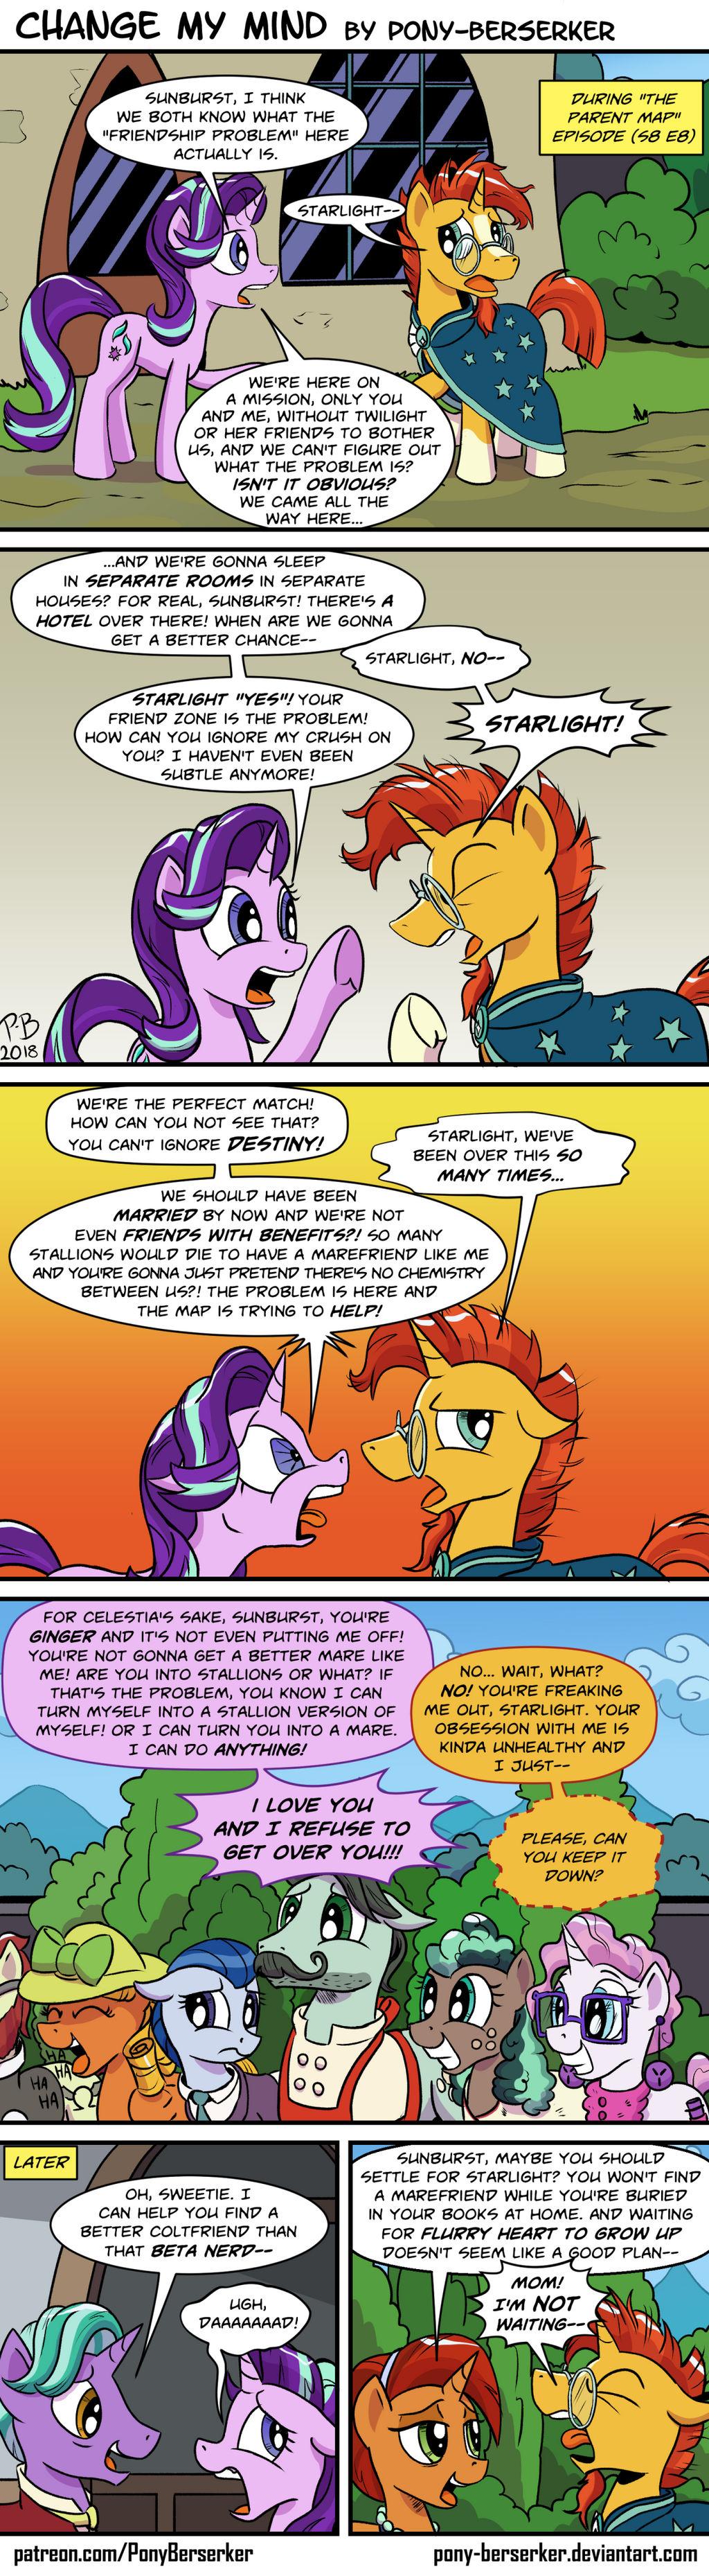 Change My Mind by Pony-Berserker